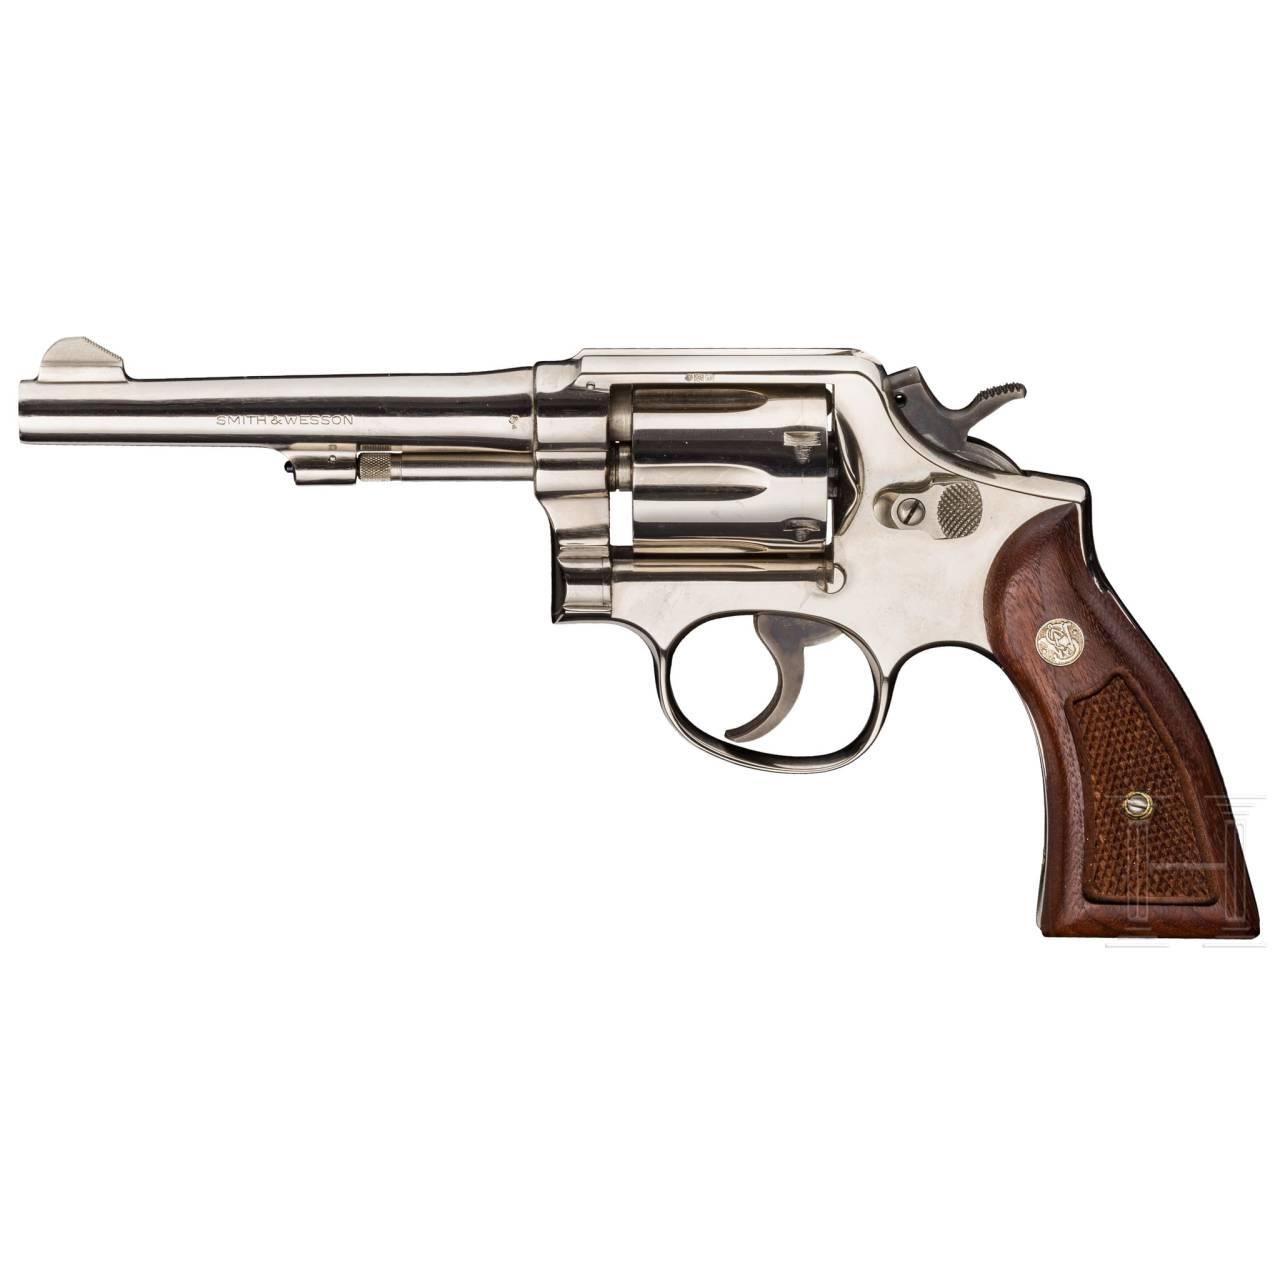 Smith & Wesson Mod. 10-5, vernickelt, Polizei